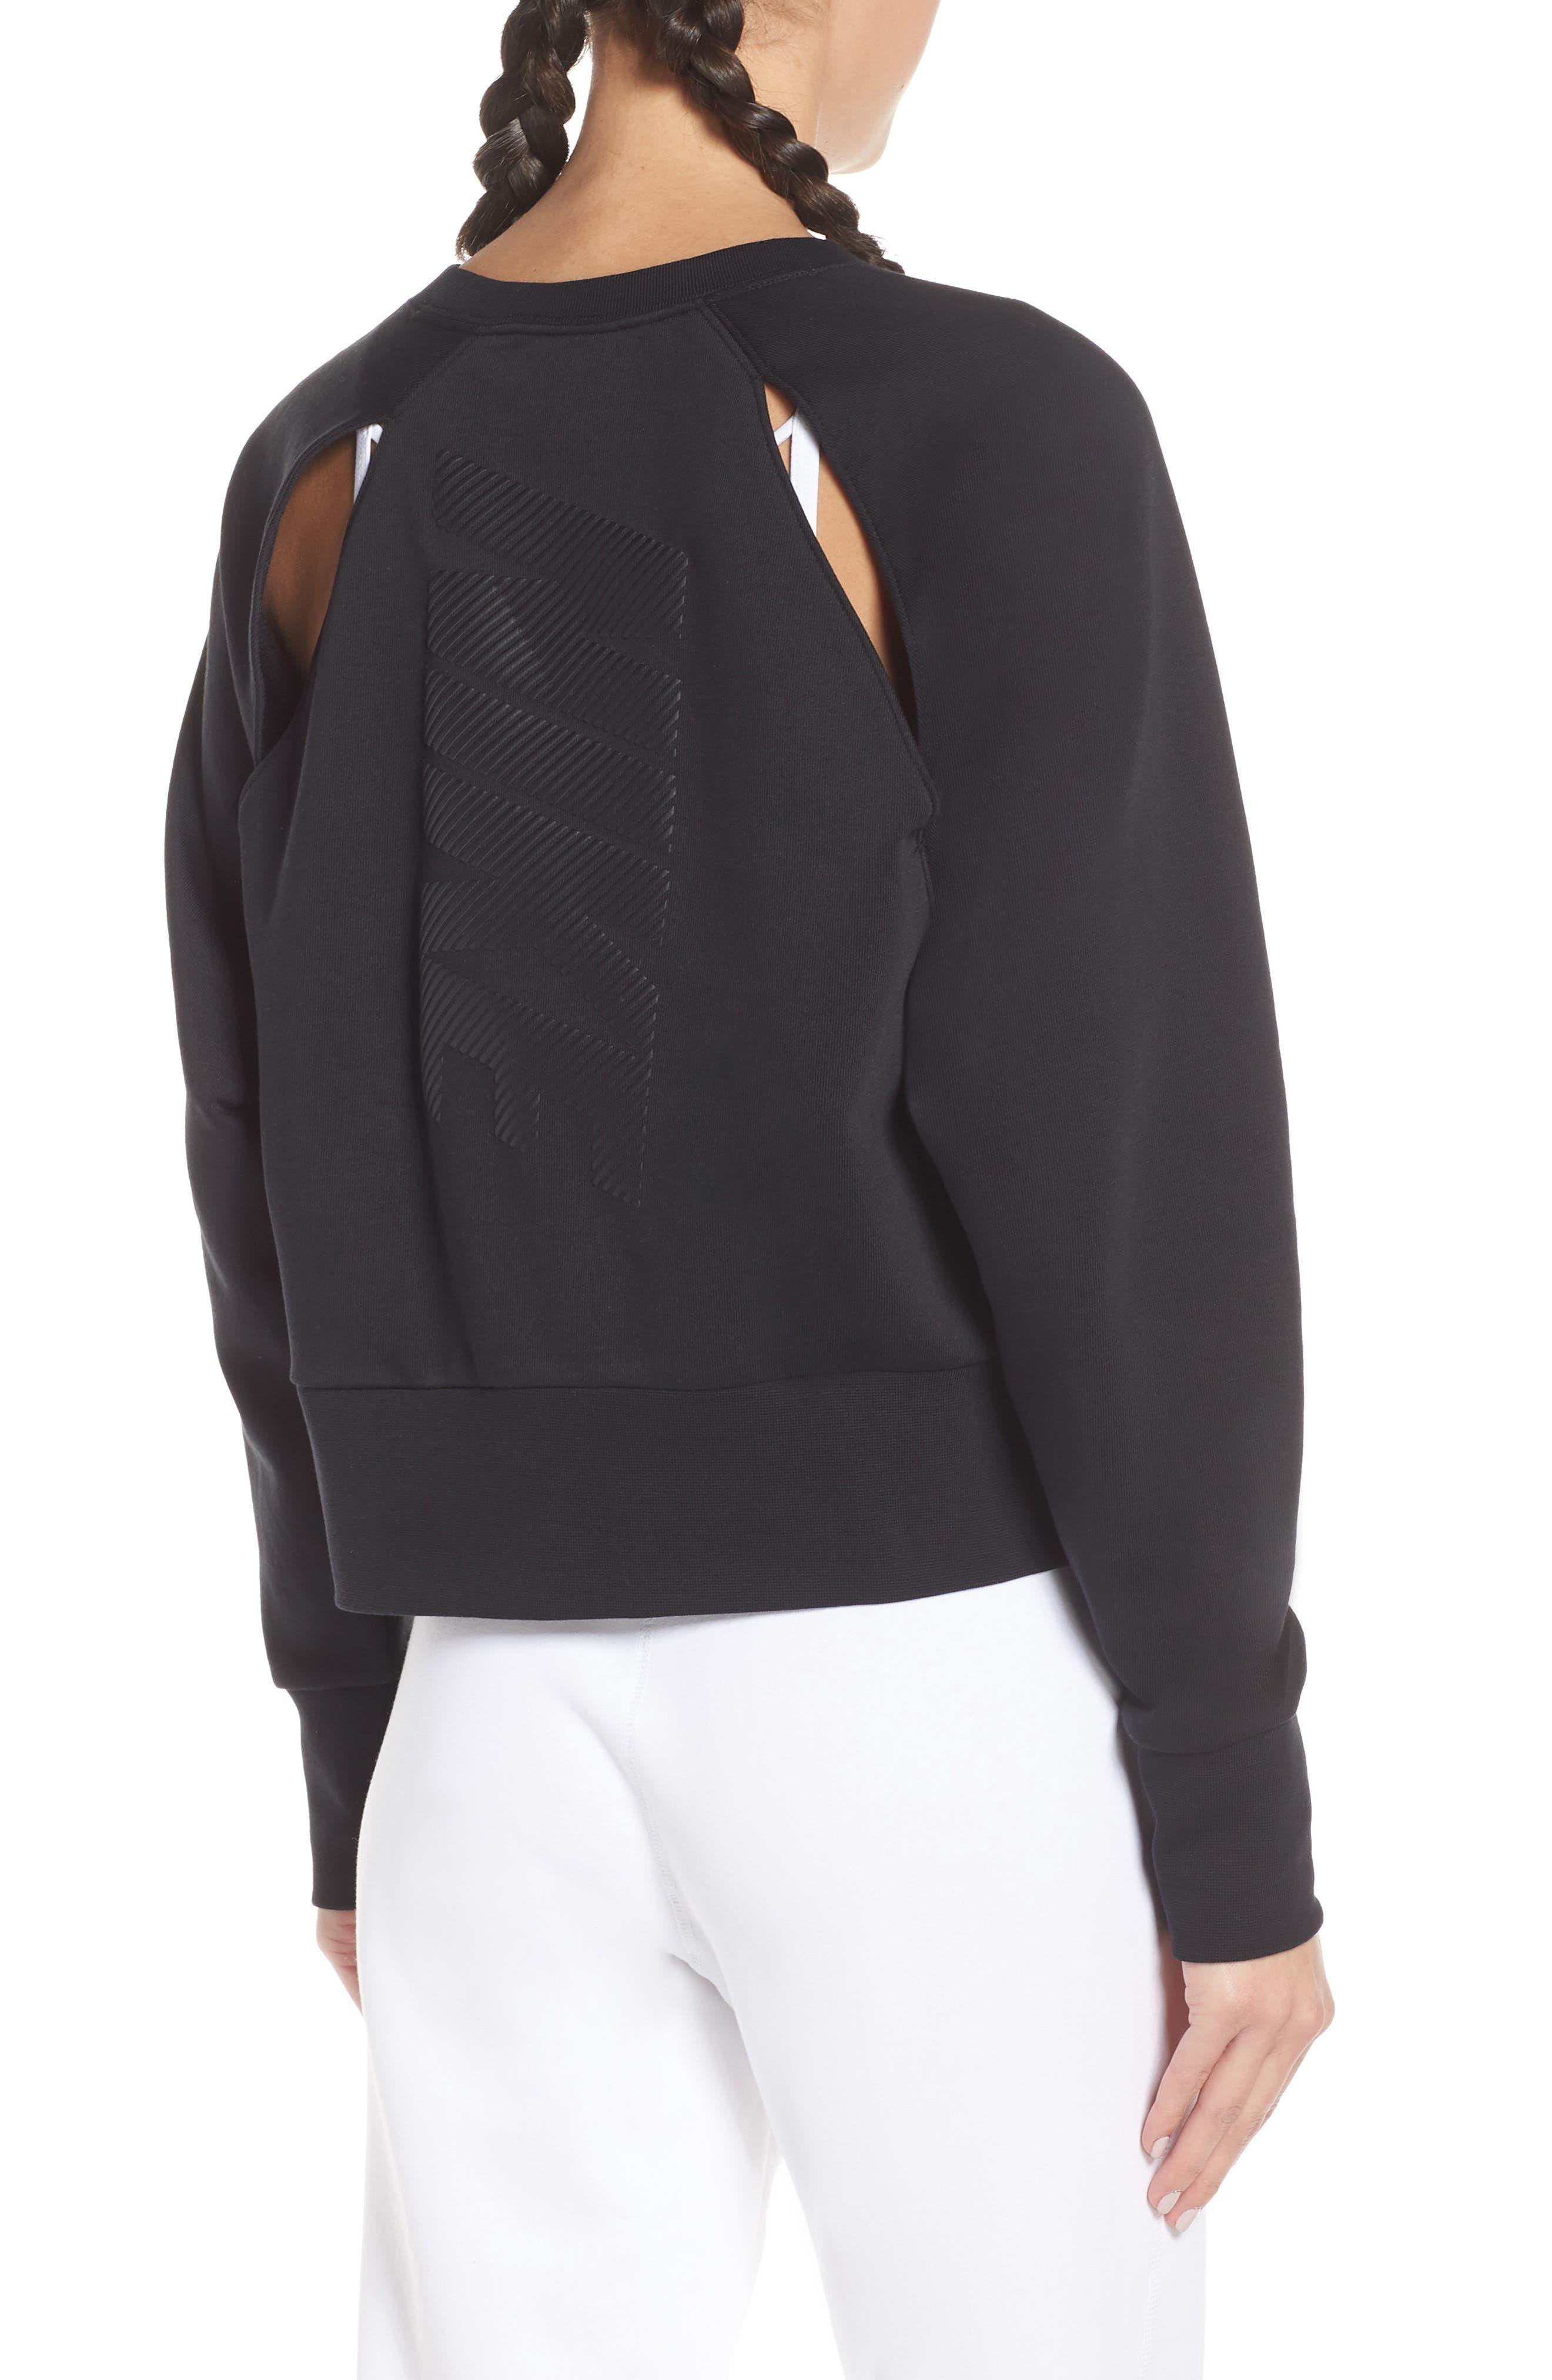 NIKE, Dry Cropped Training Sweatshirt, Alternate thumbnail 2, color, BLACK/ WHITE